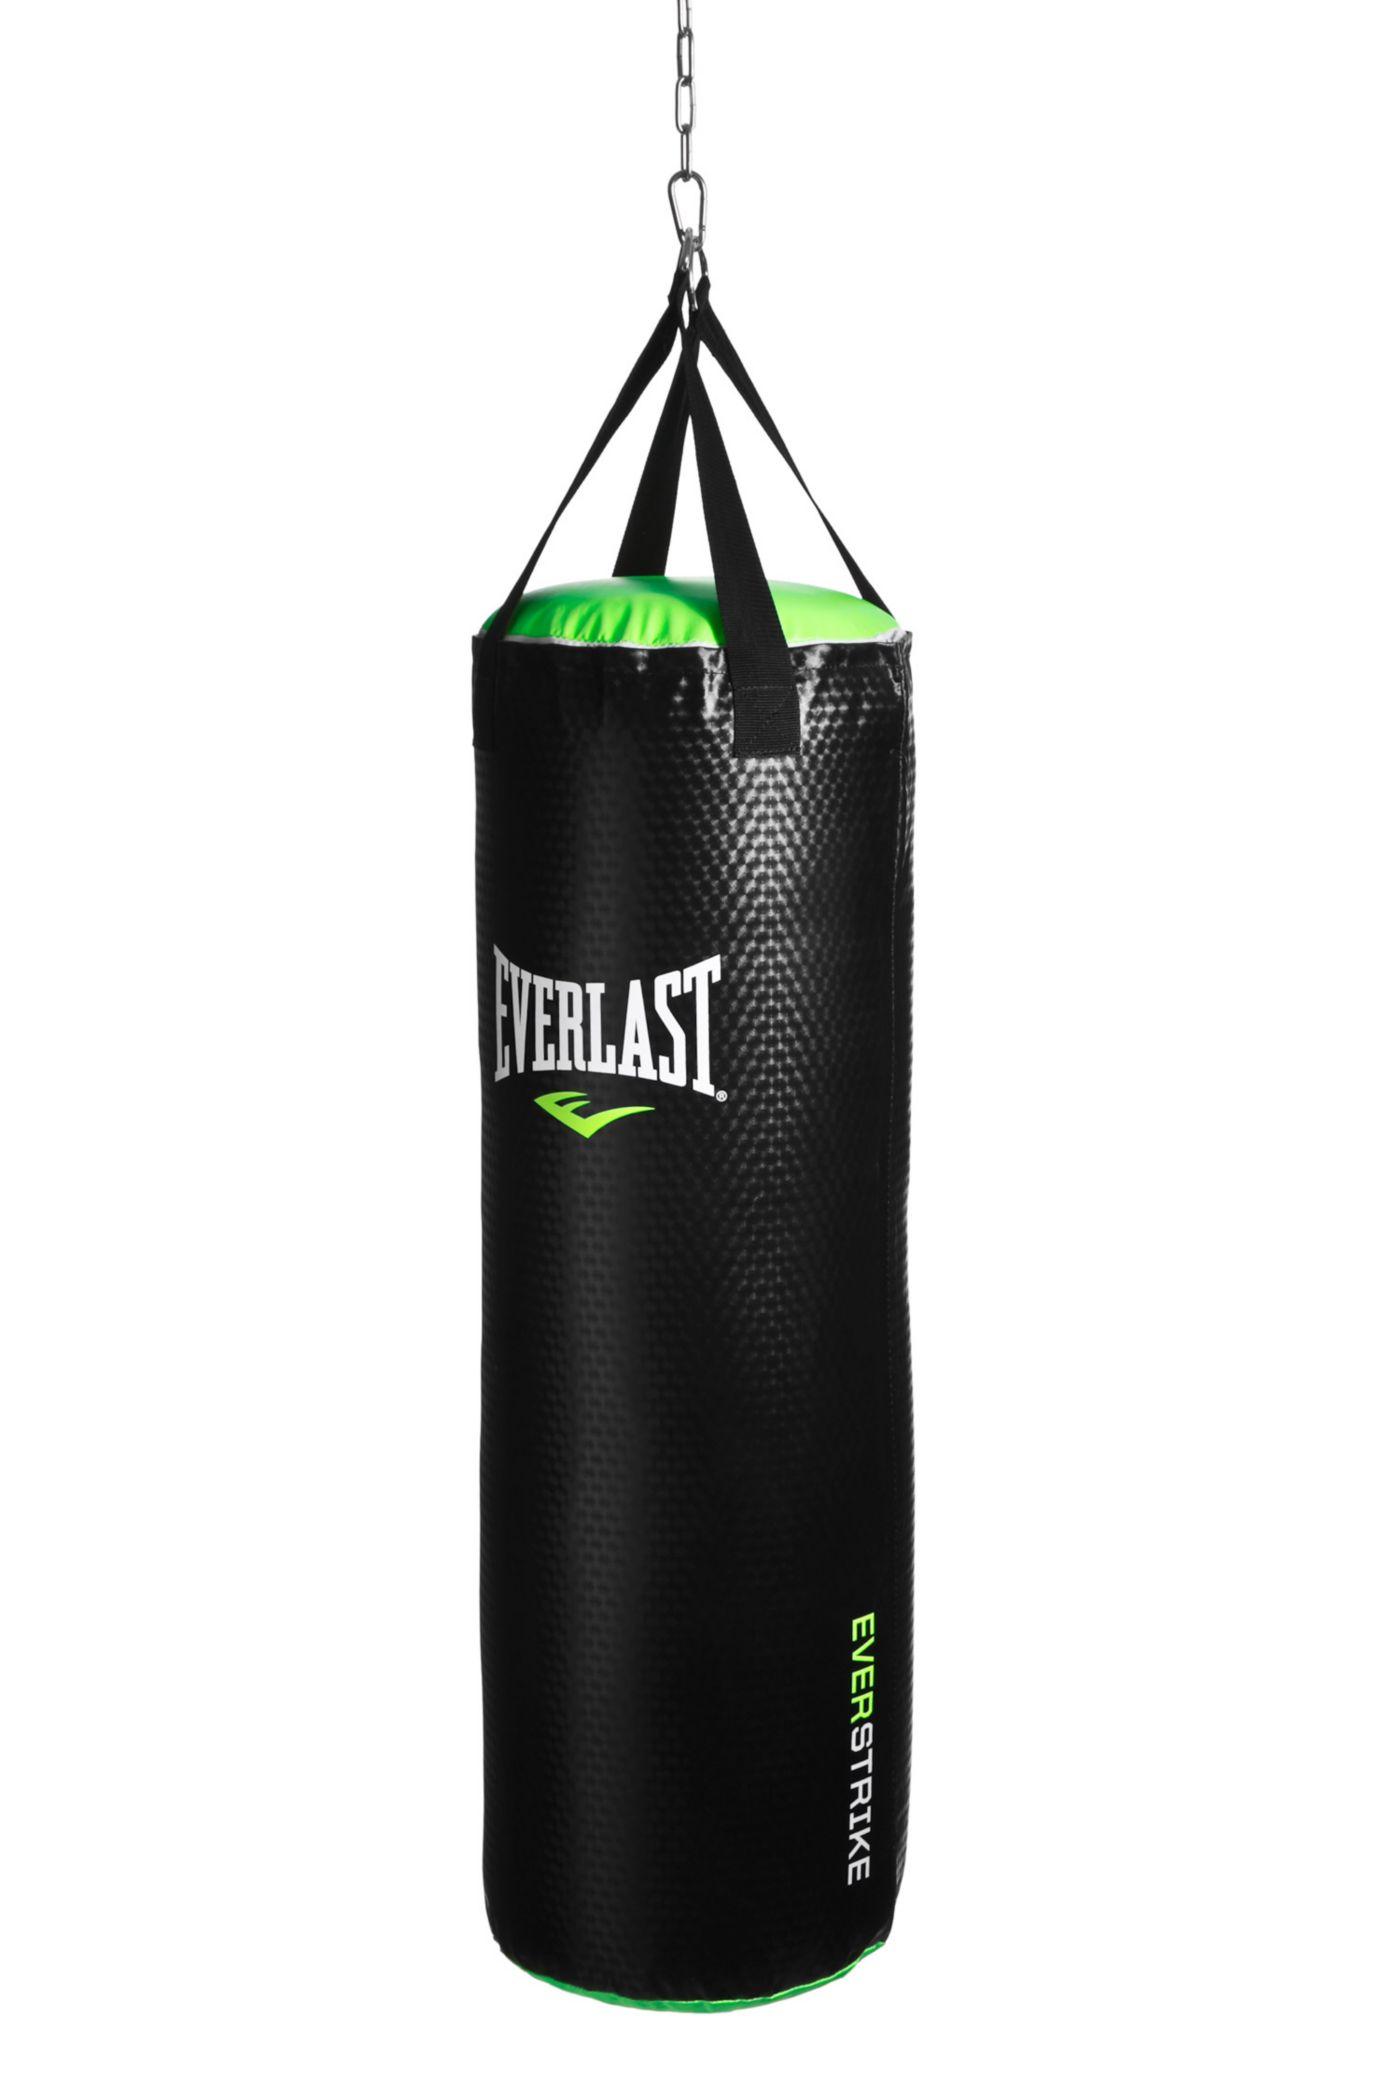 Everlast 70 lb EverStrike NevaTear Heavy Training Bag